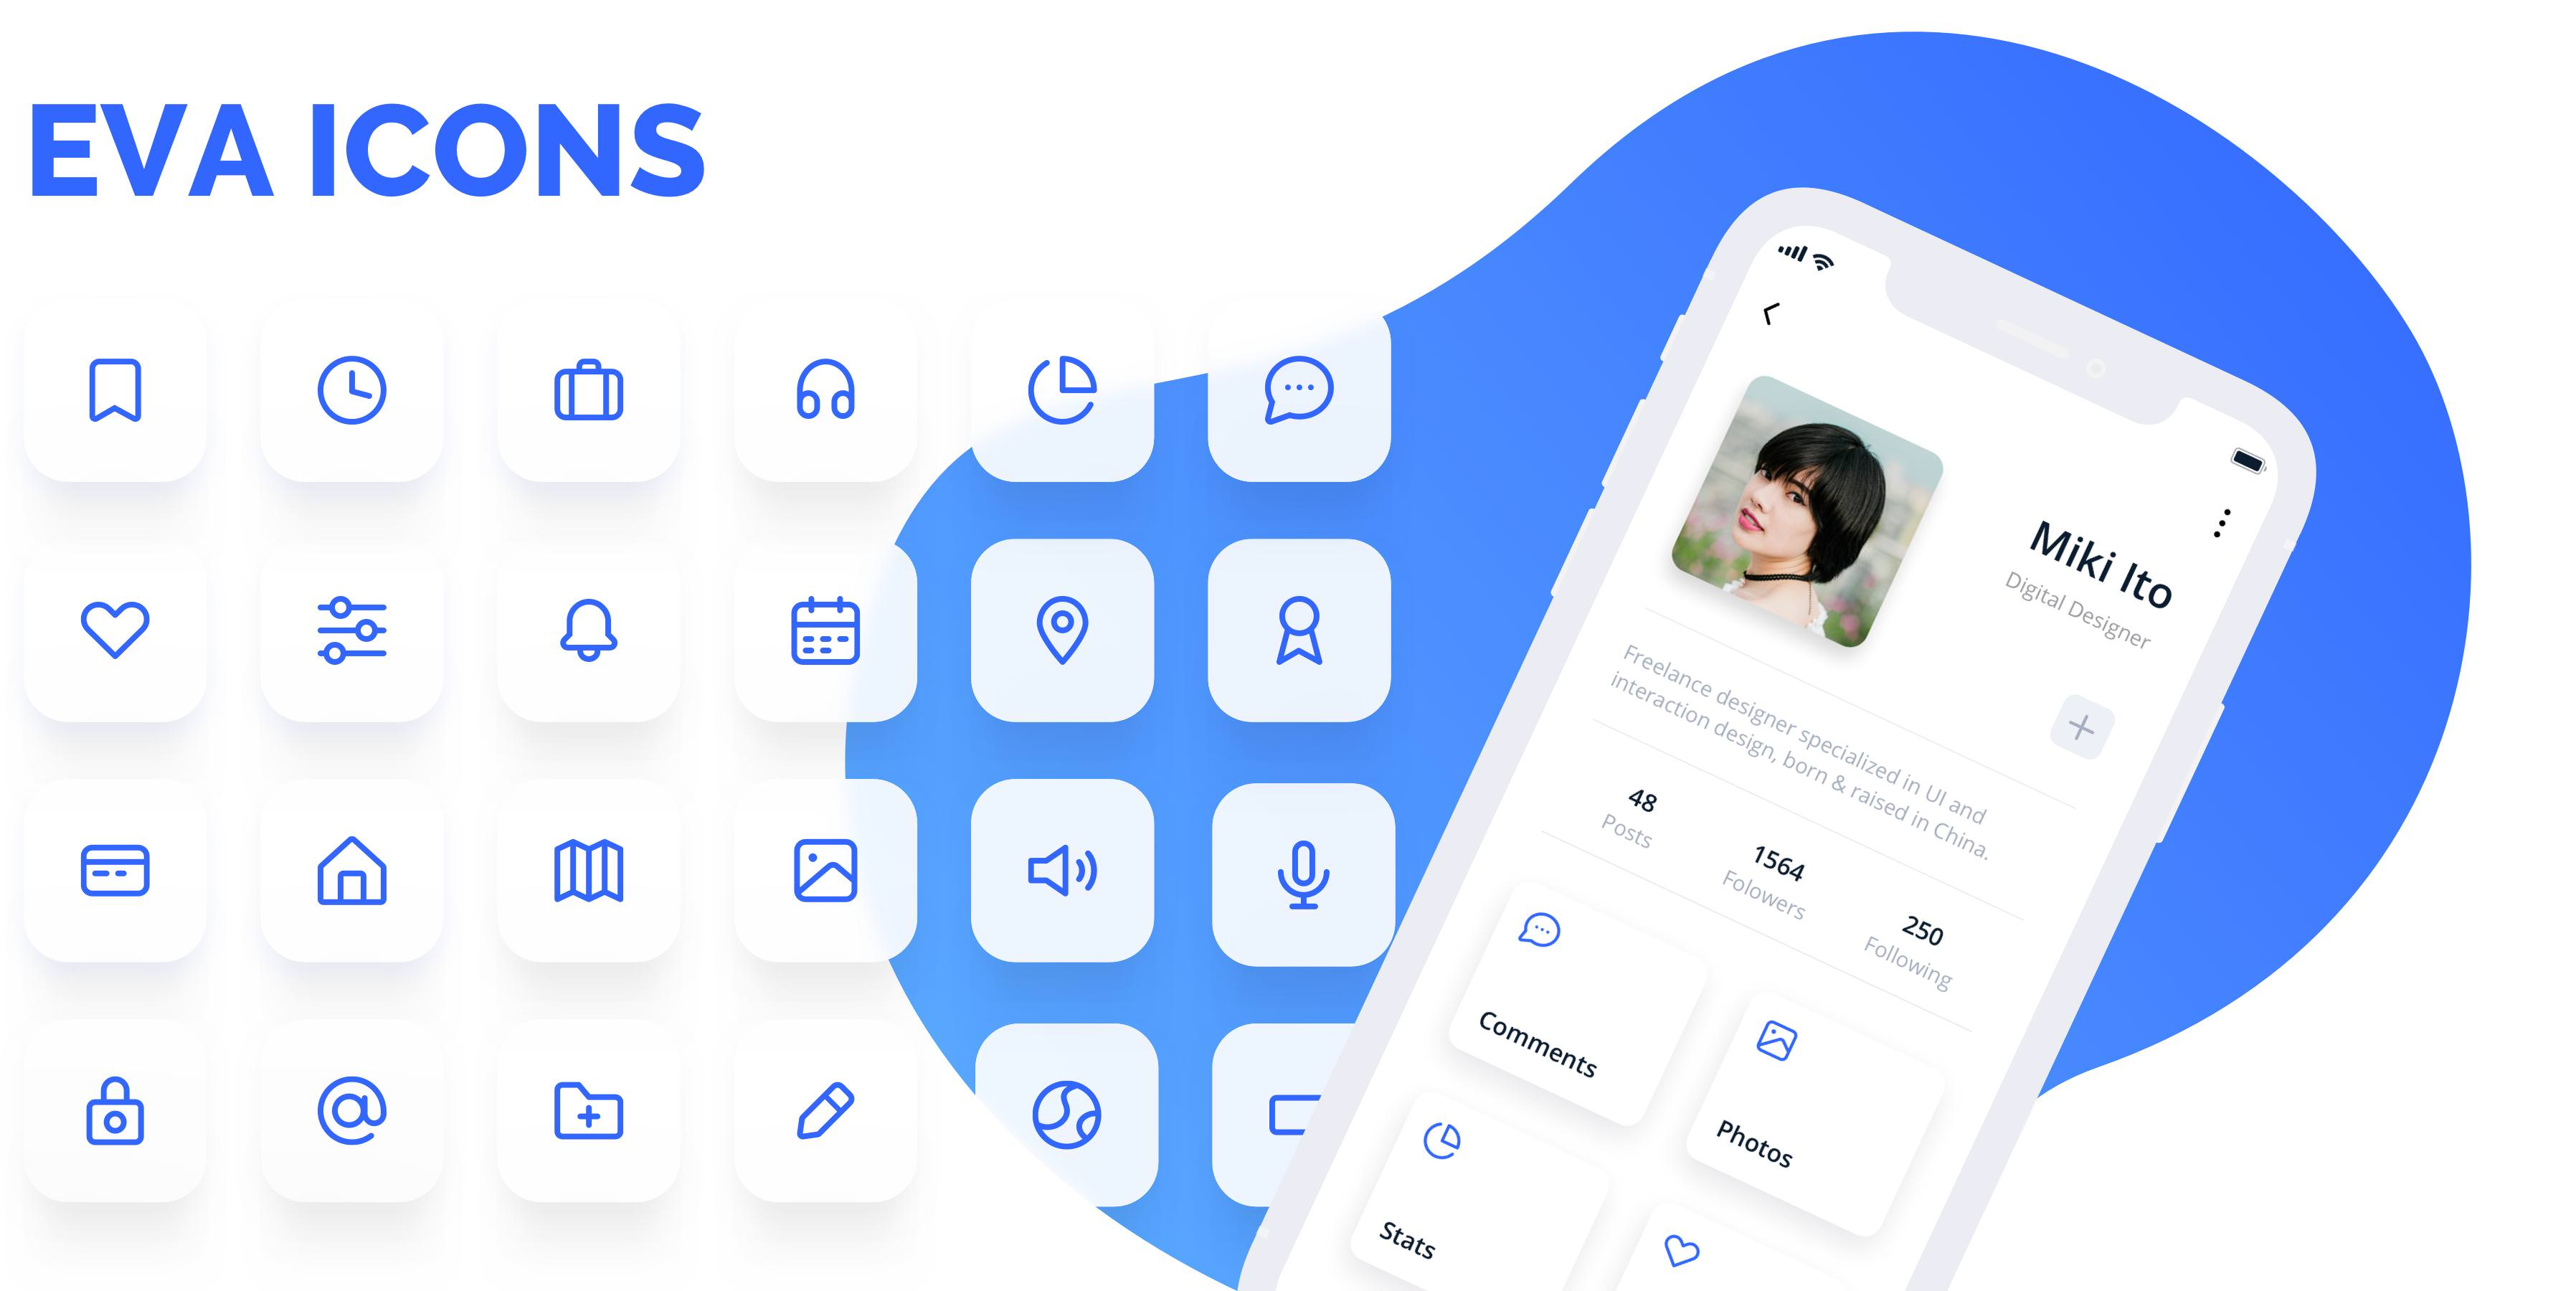 GitHub - akveo/eva-icons: A pack of more than 480